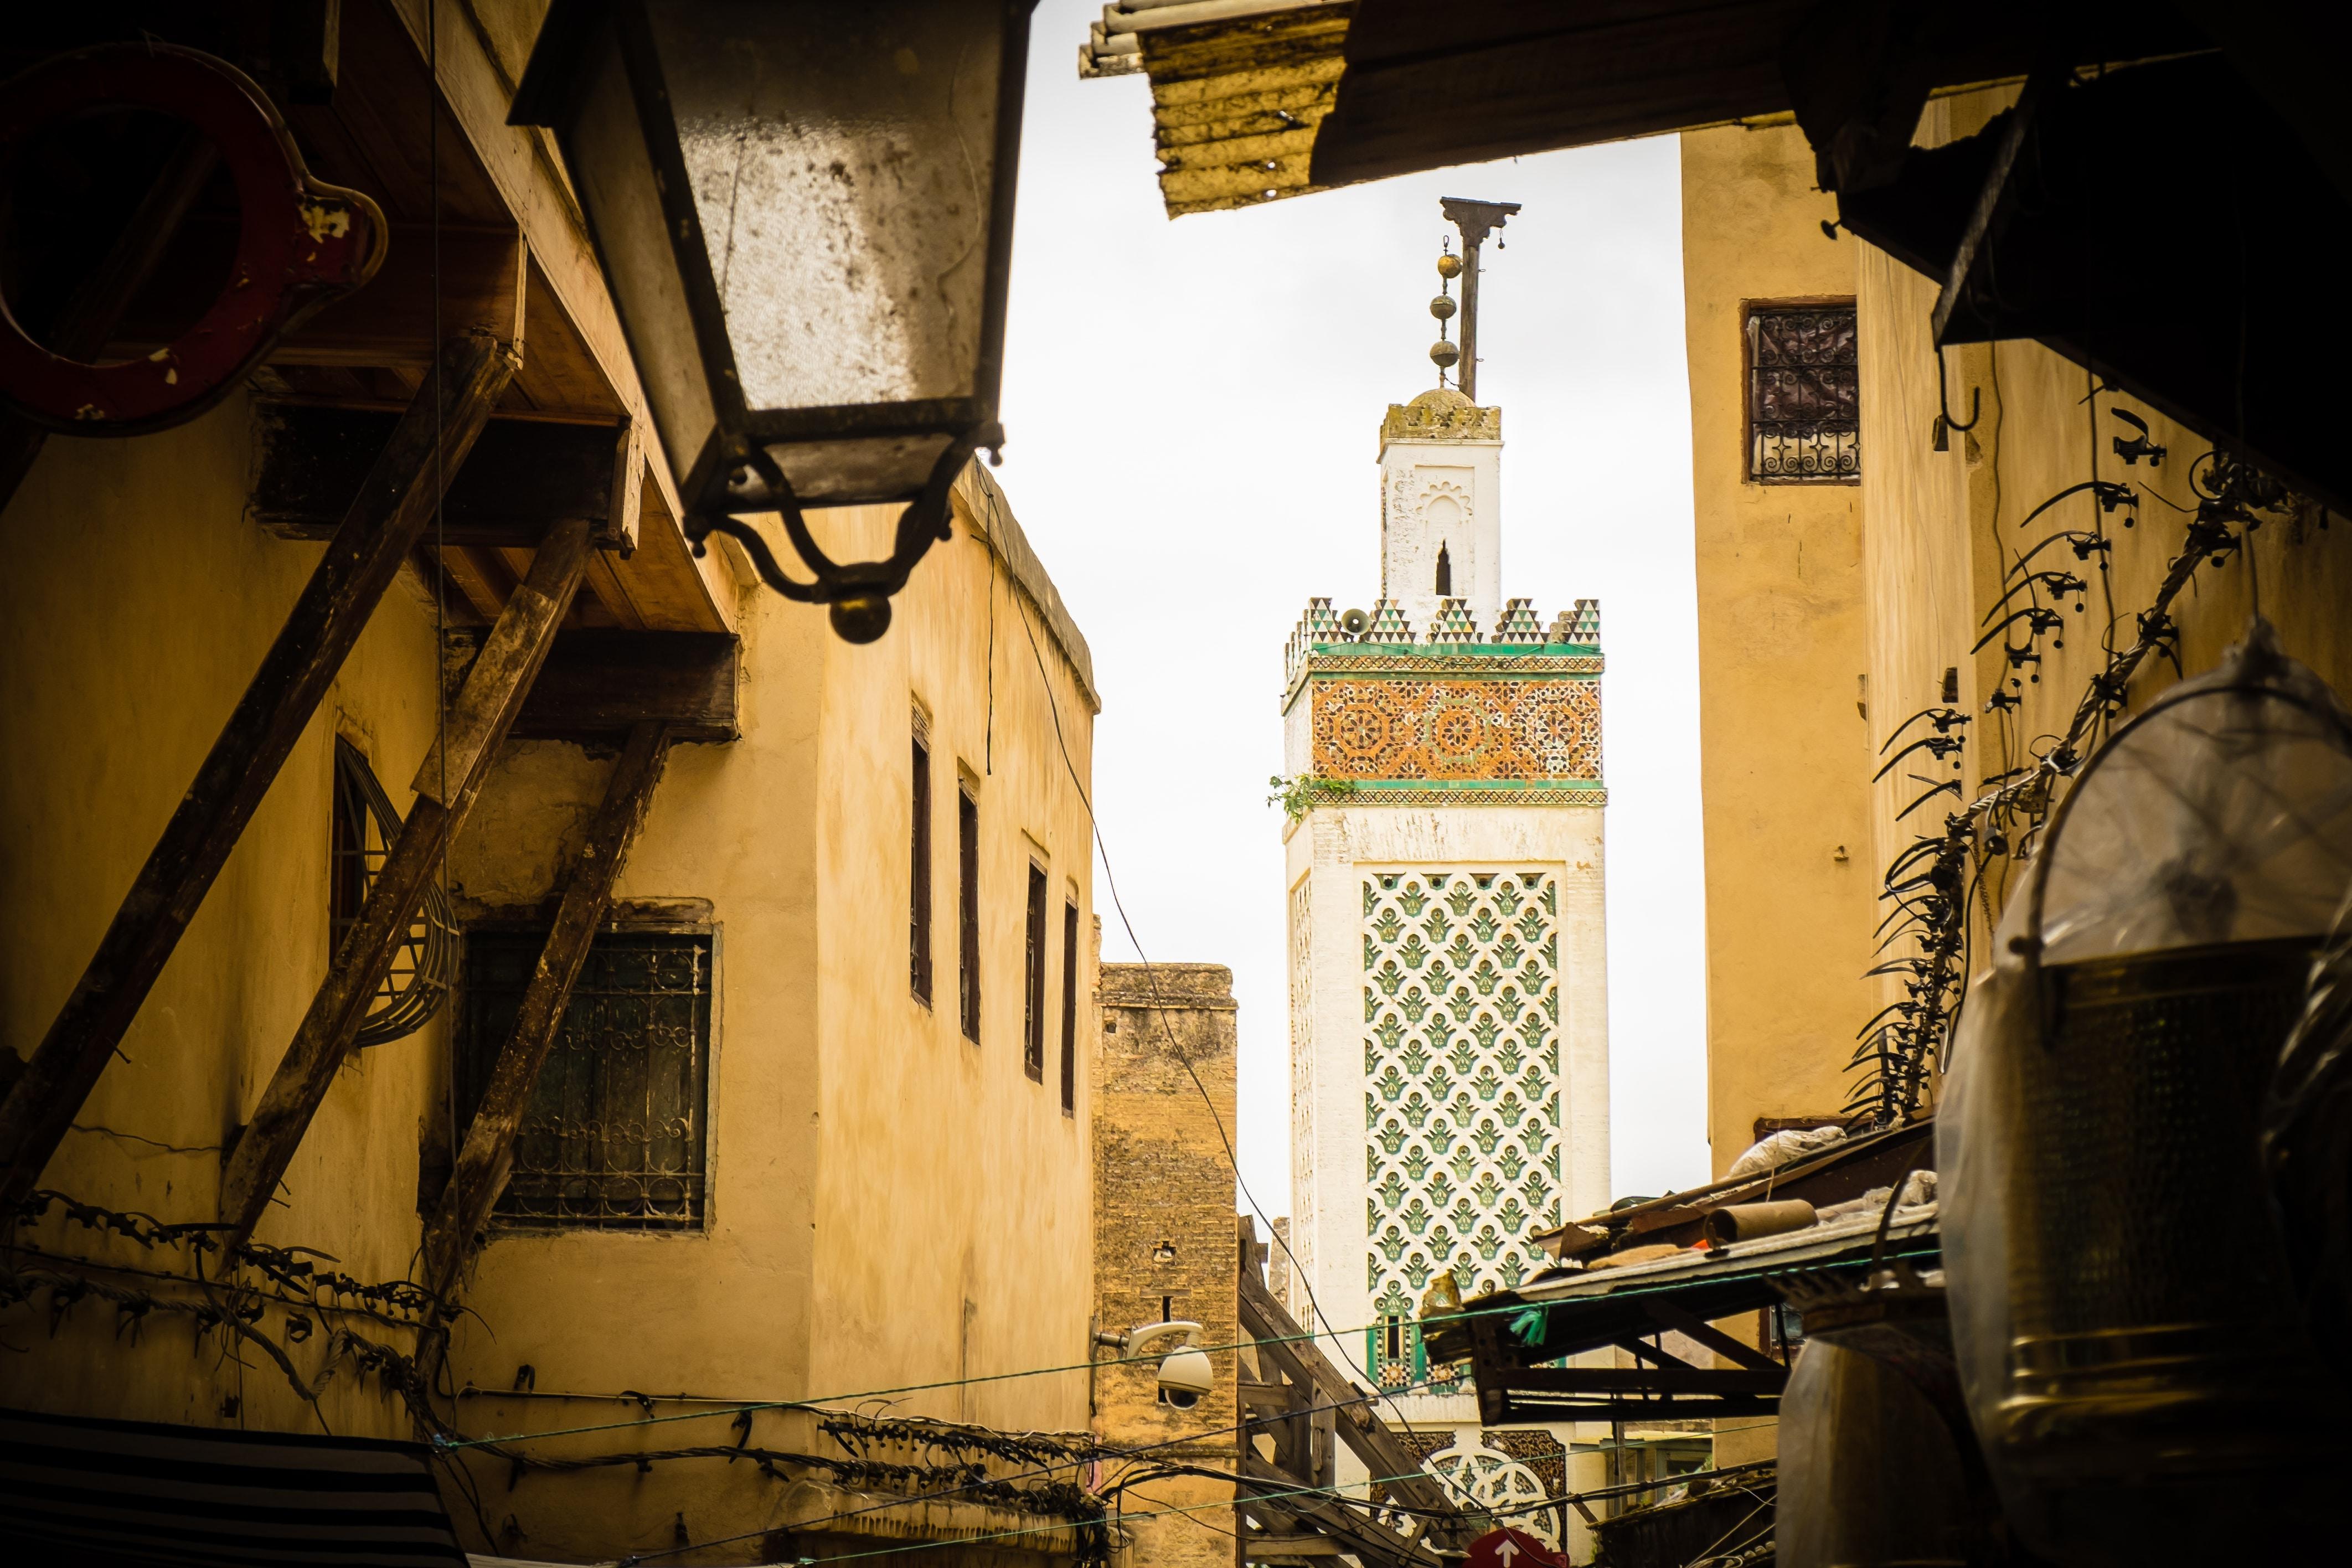 Genevieve Hathaway_Morocco_Fez_Medina_minaret